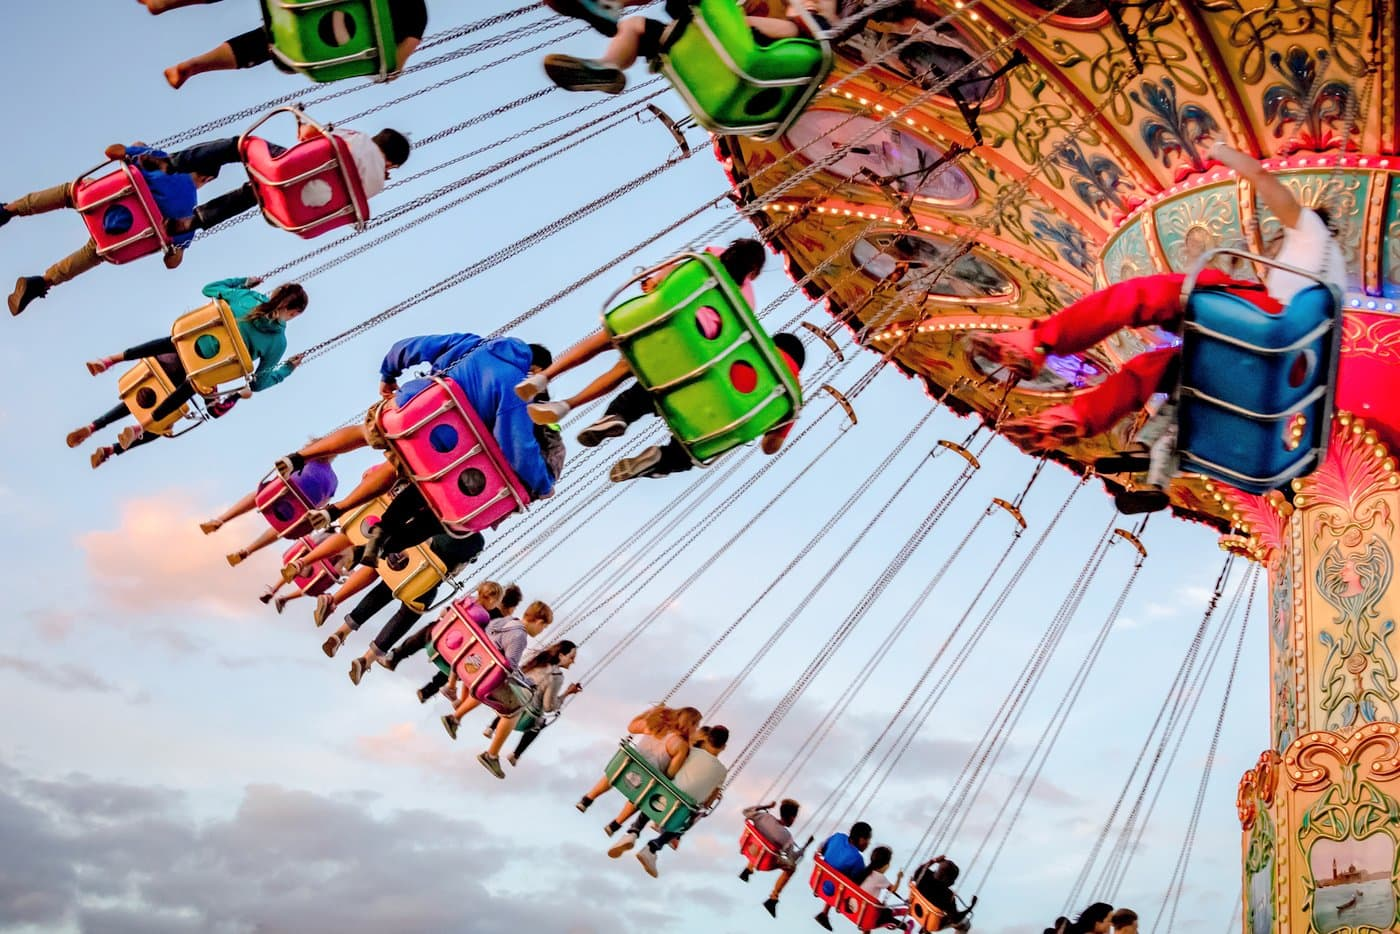 Carnival - amusement park ride